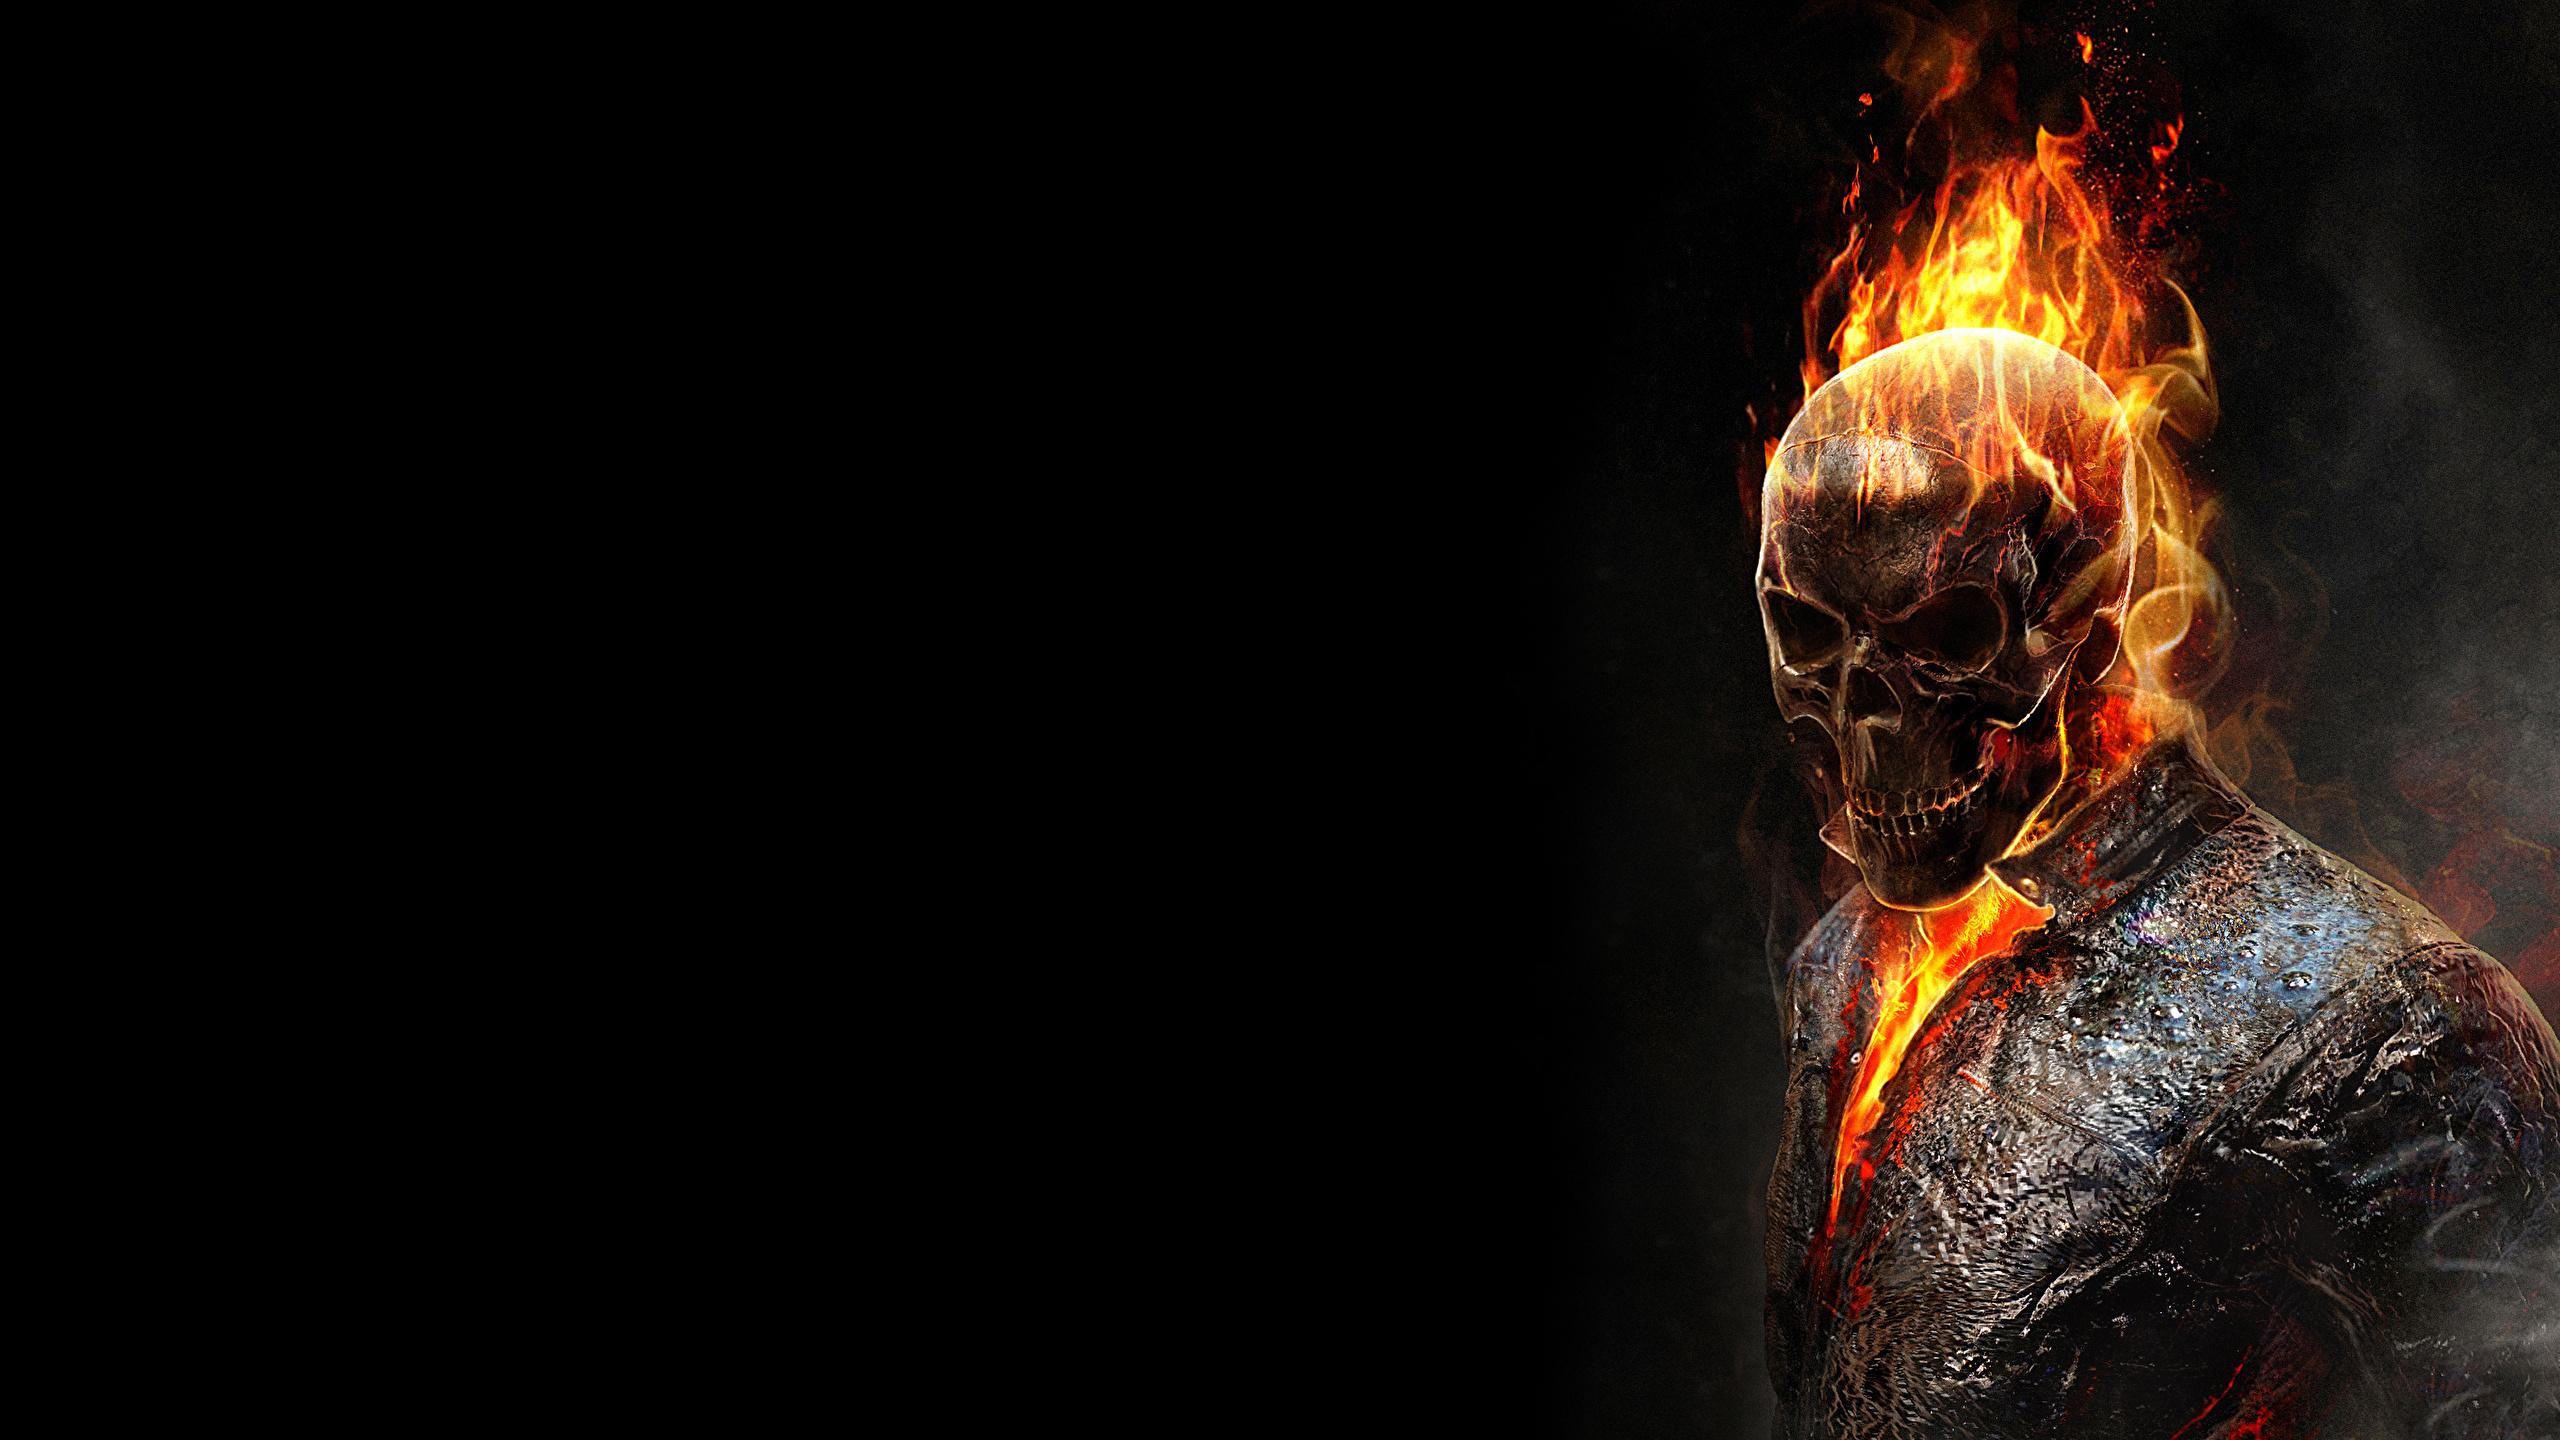 Fonds Decran 2560x1440 Ghost Rider Crâne Feu Fan Art Fond